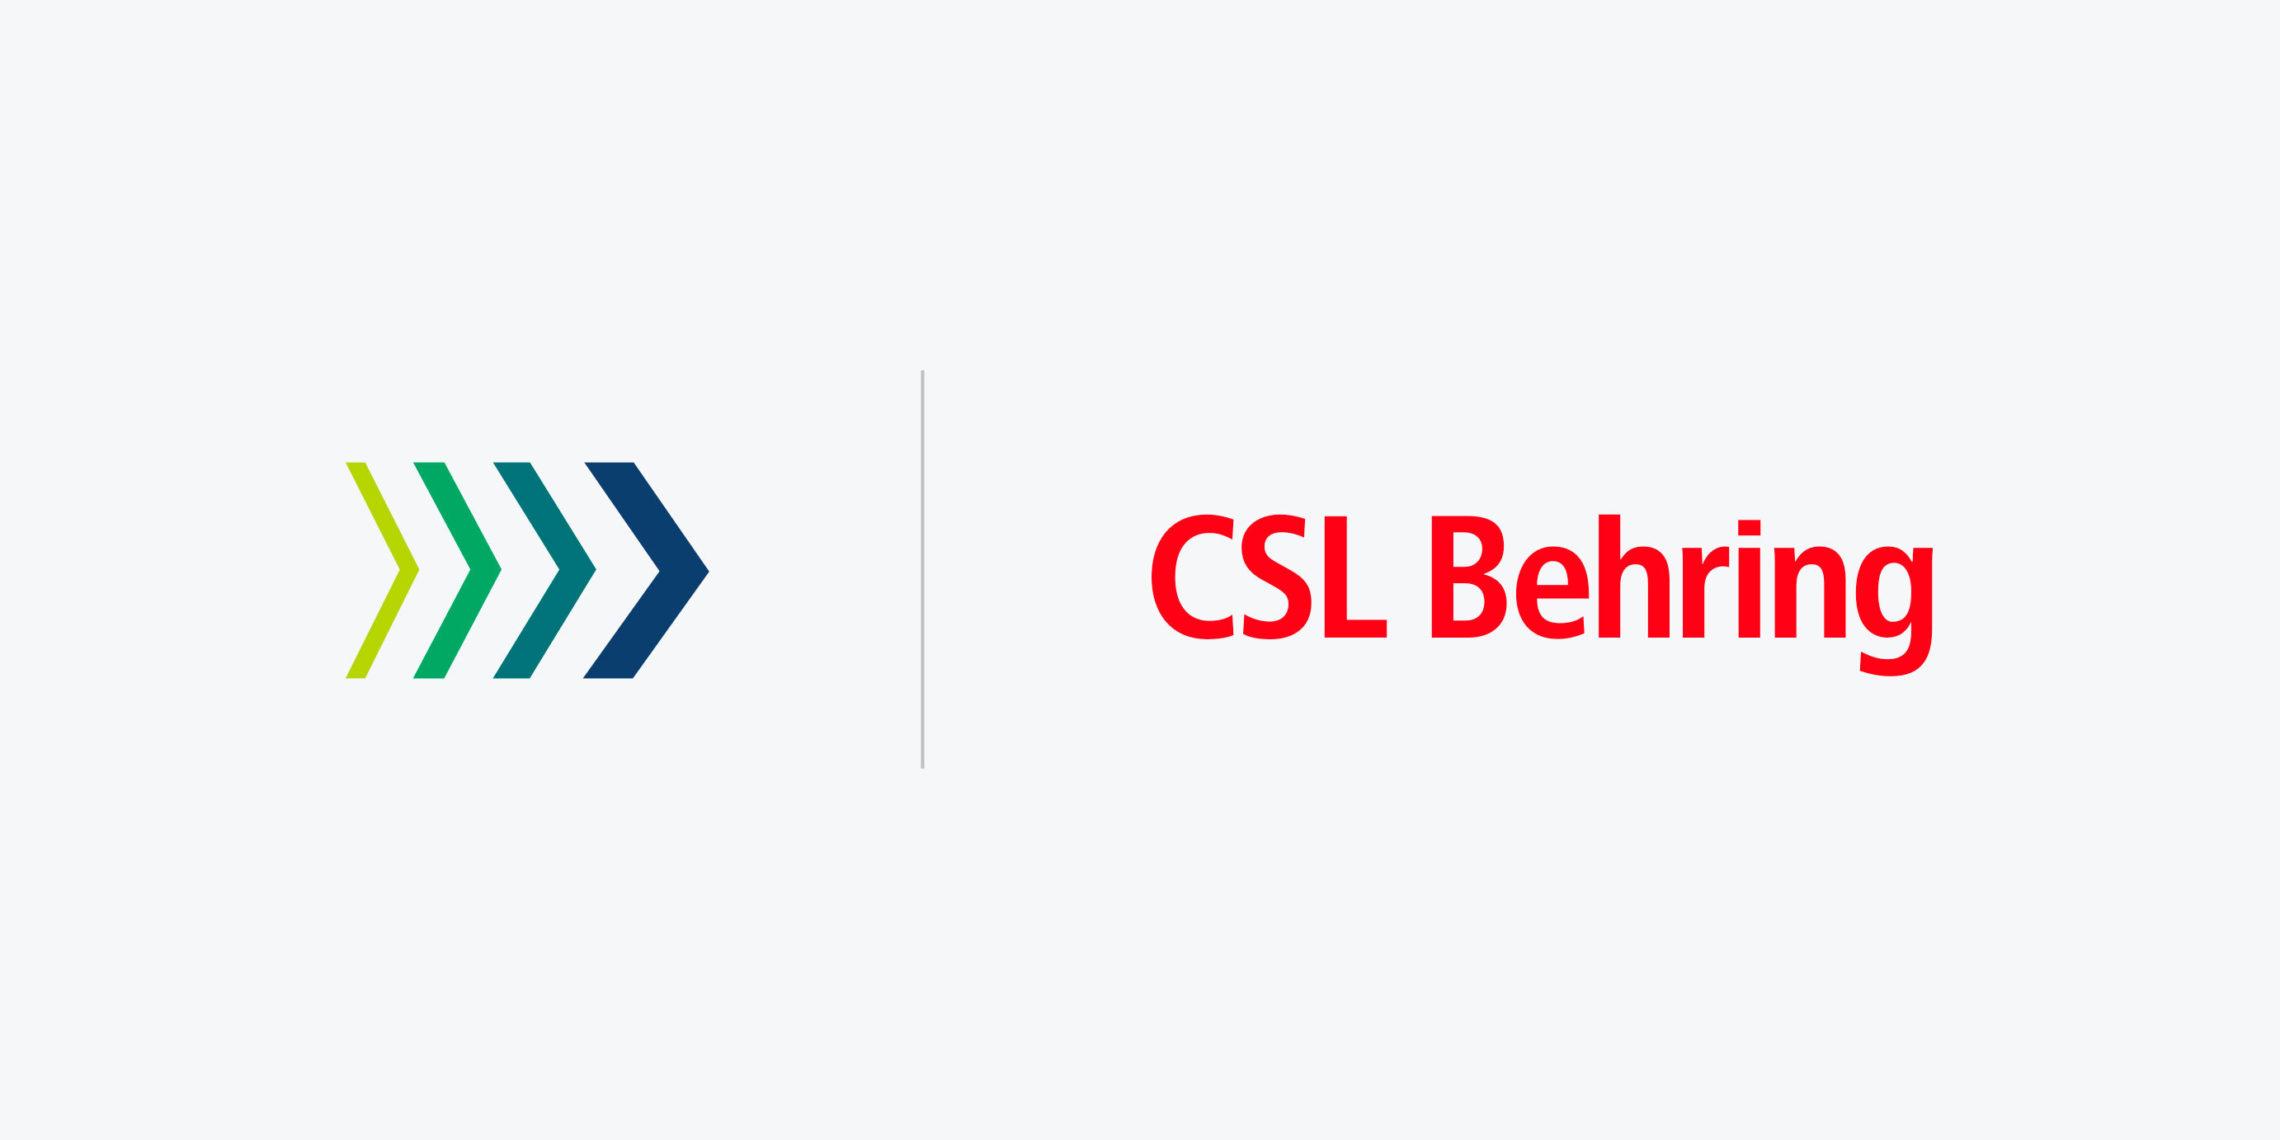 Blog body CSL Behring partnership